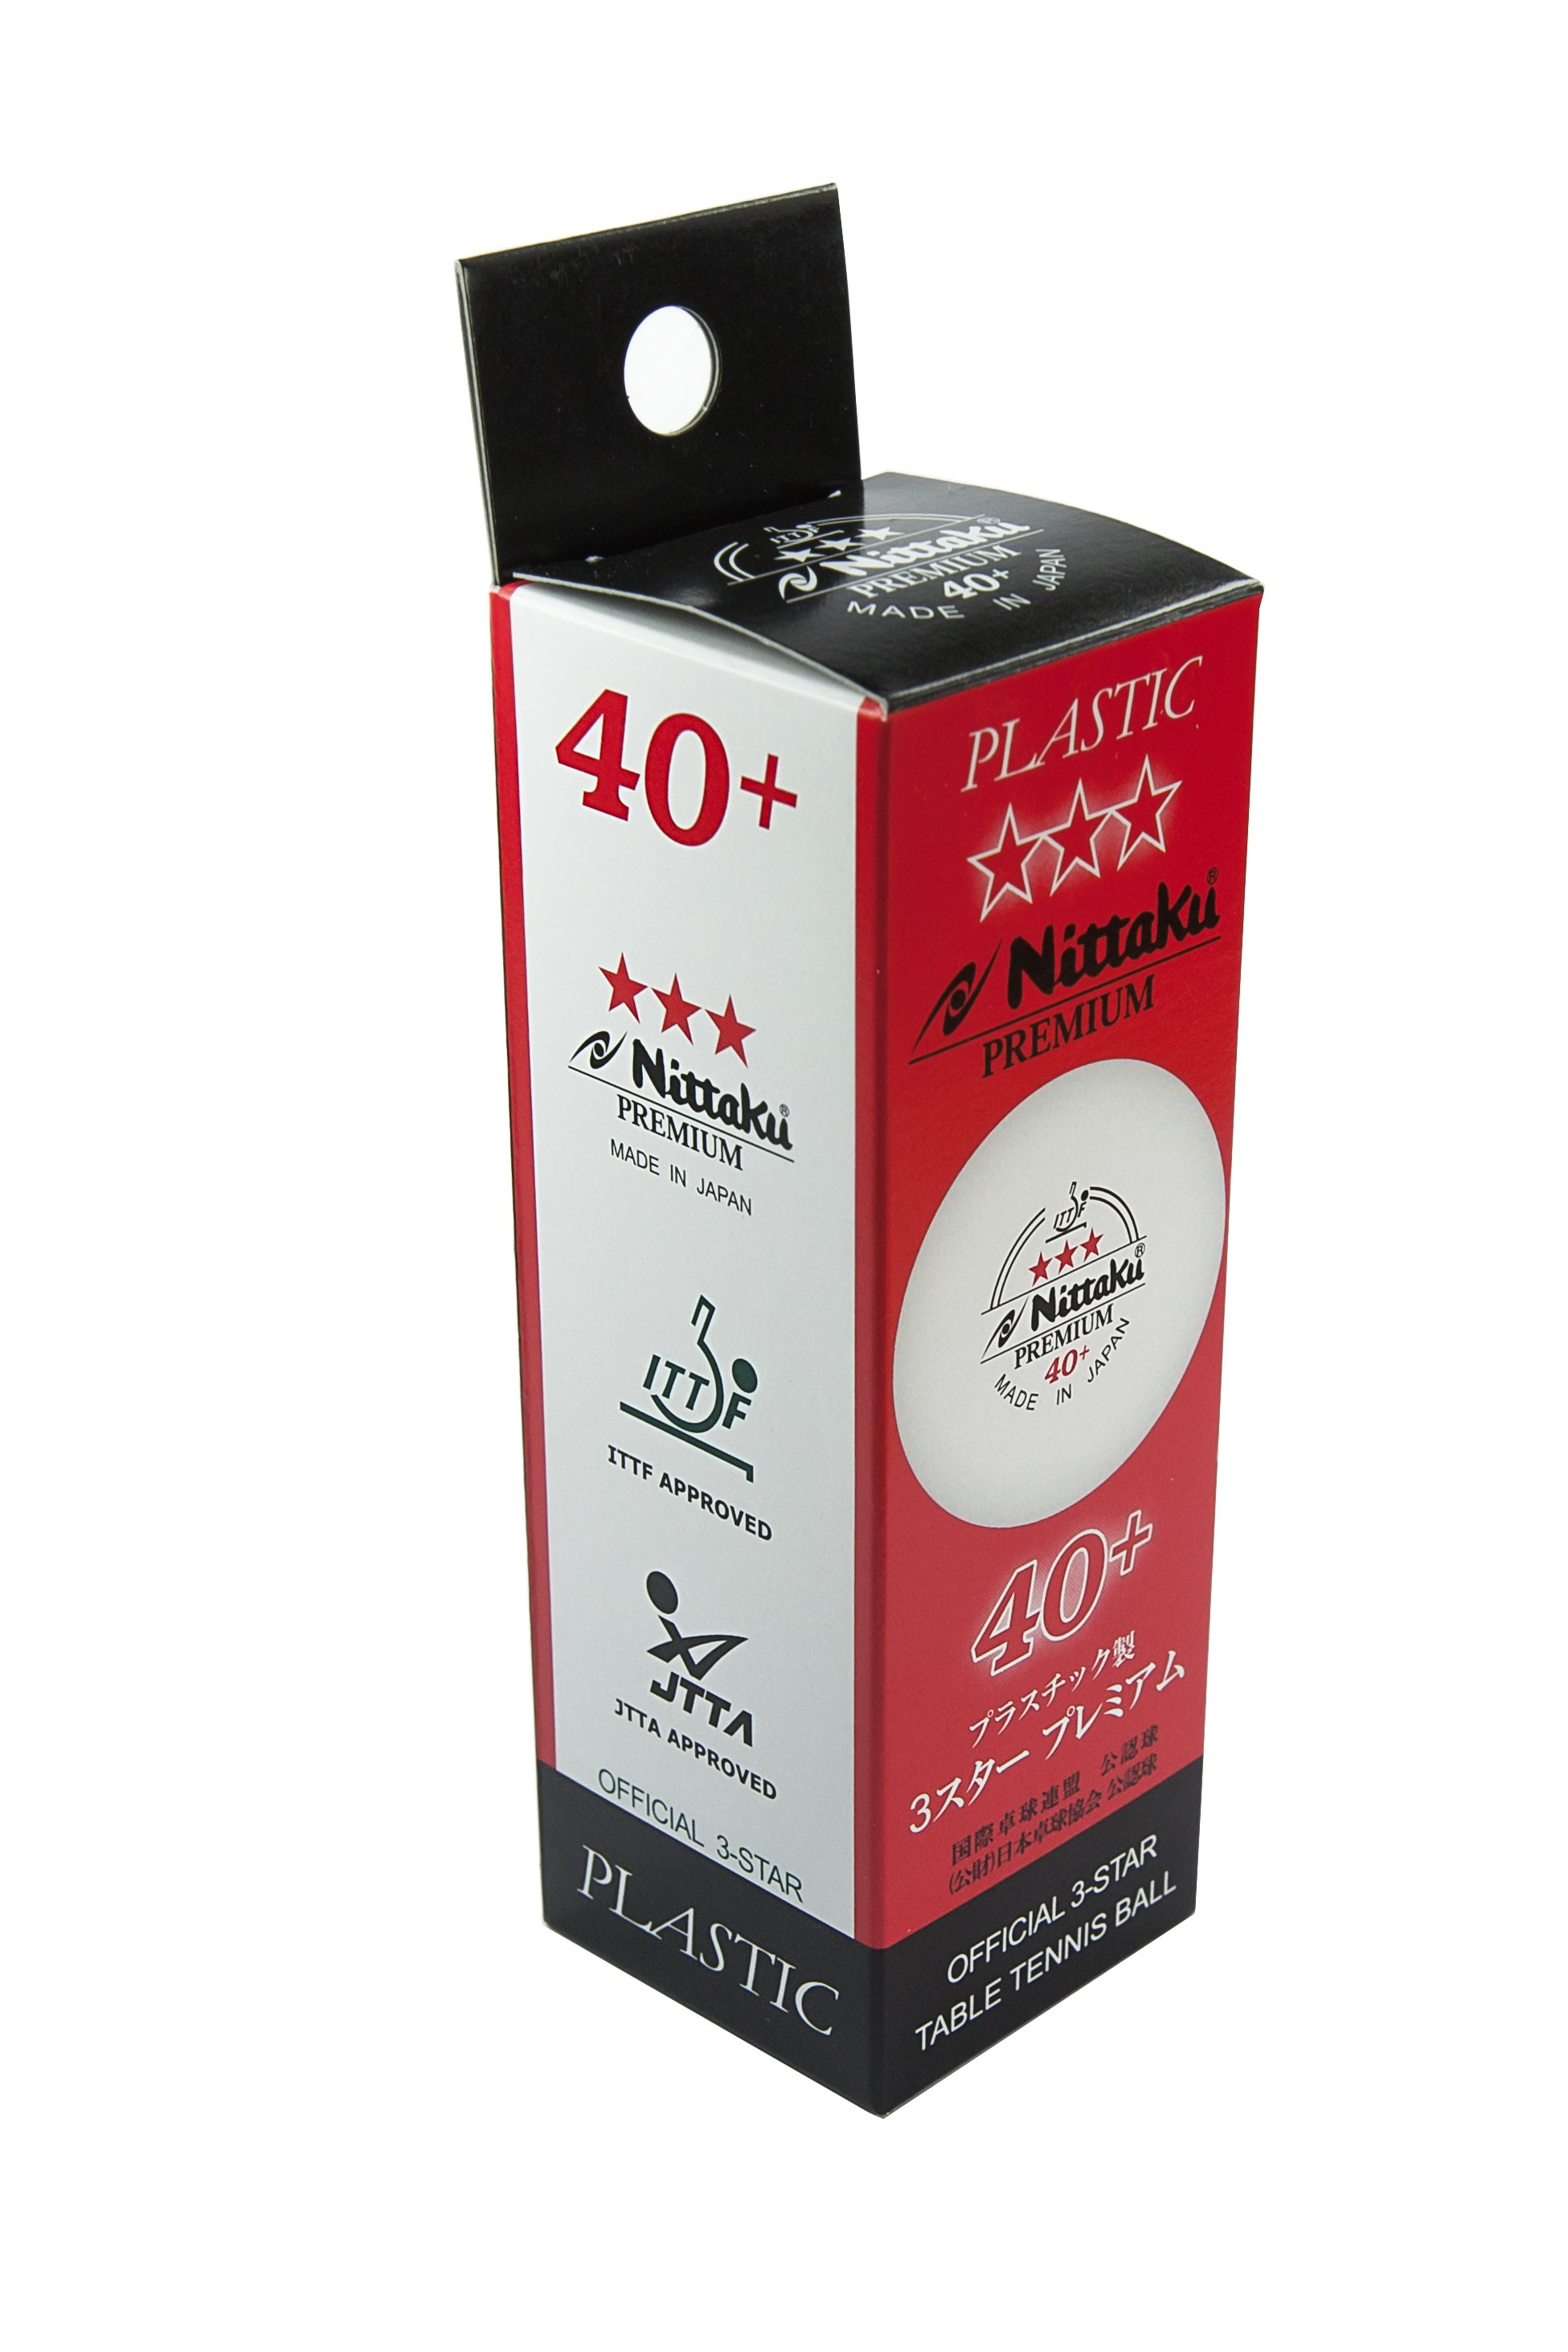 Nittaku Premium 3 Star Table Tennis Balls Pack of 3 White